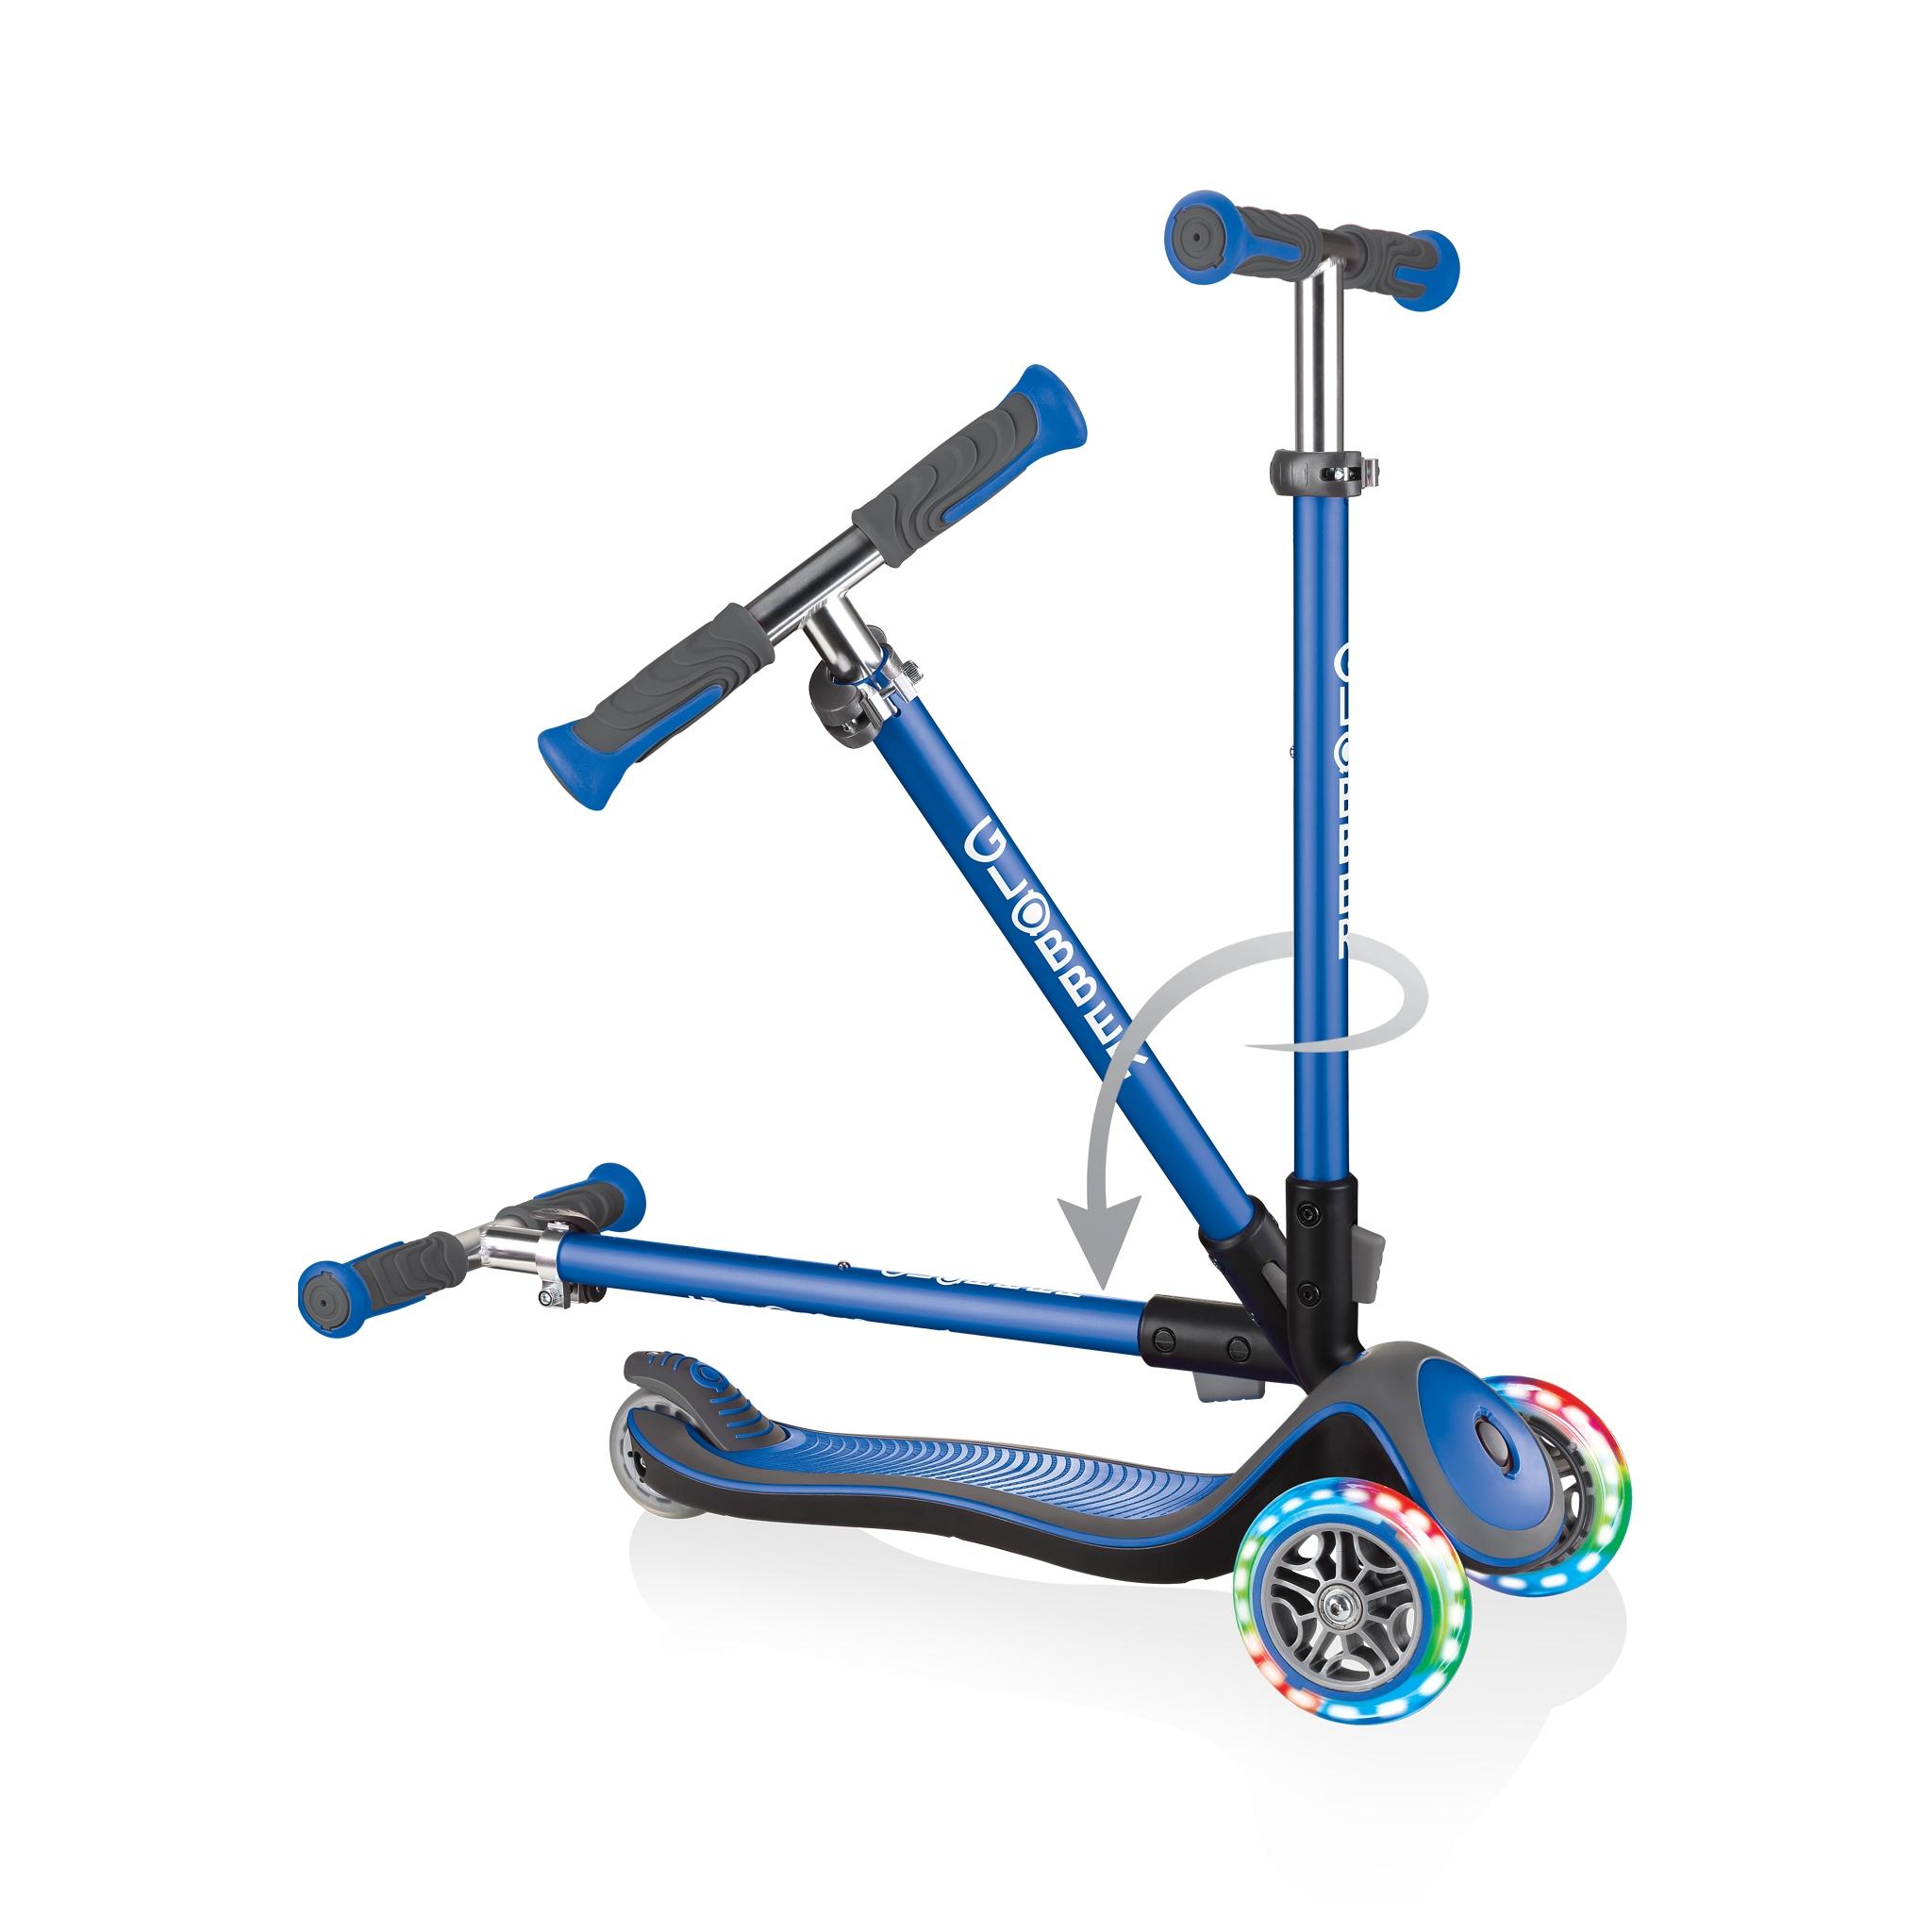 Globber-ELITE-DELUXE-LIGHTS-3-wheel-light-up-scooter-for-kids-fold-up-scooter-navy-blue